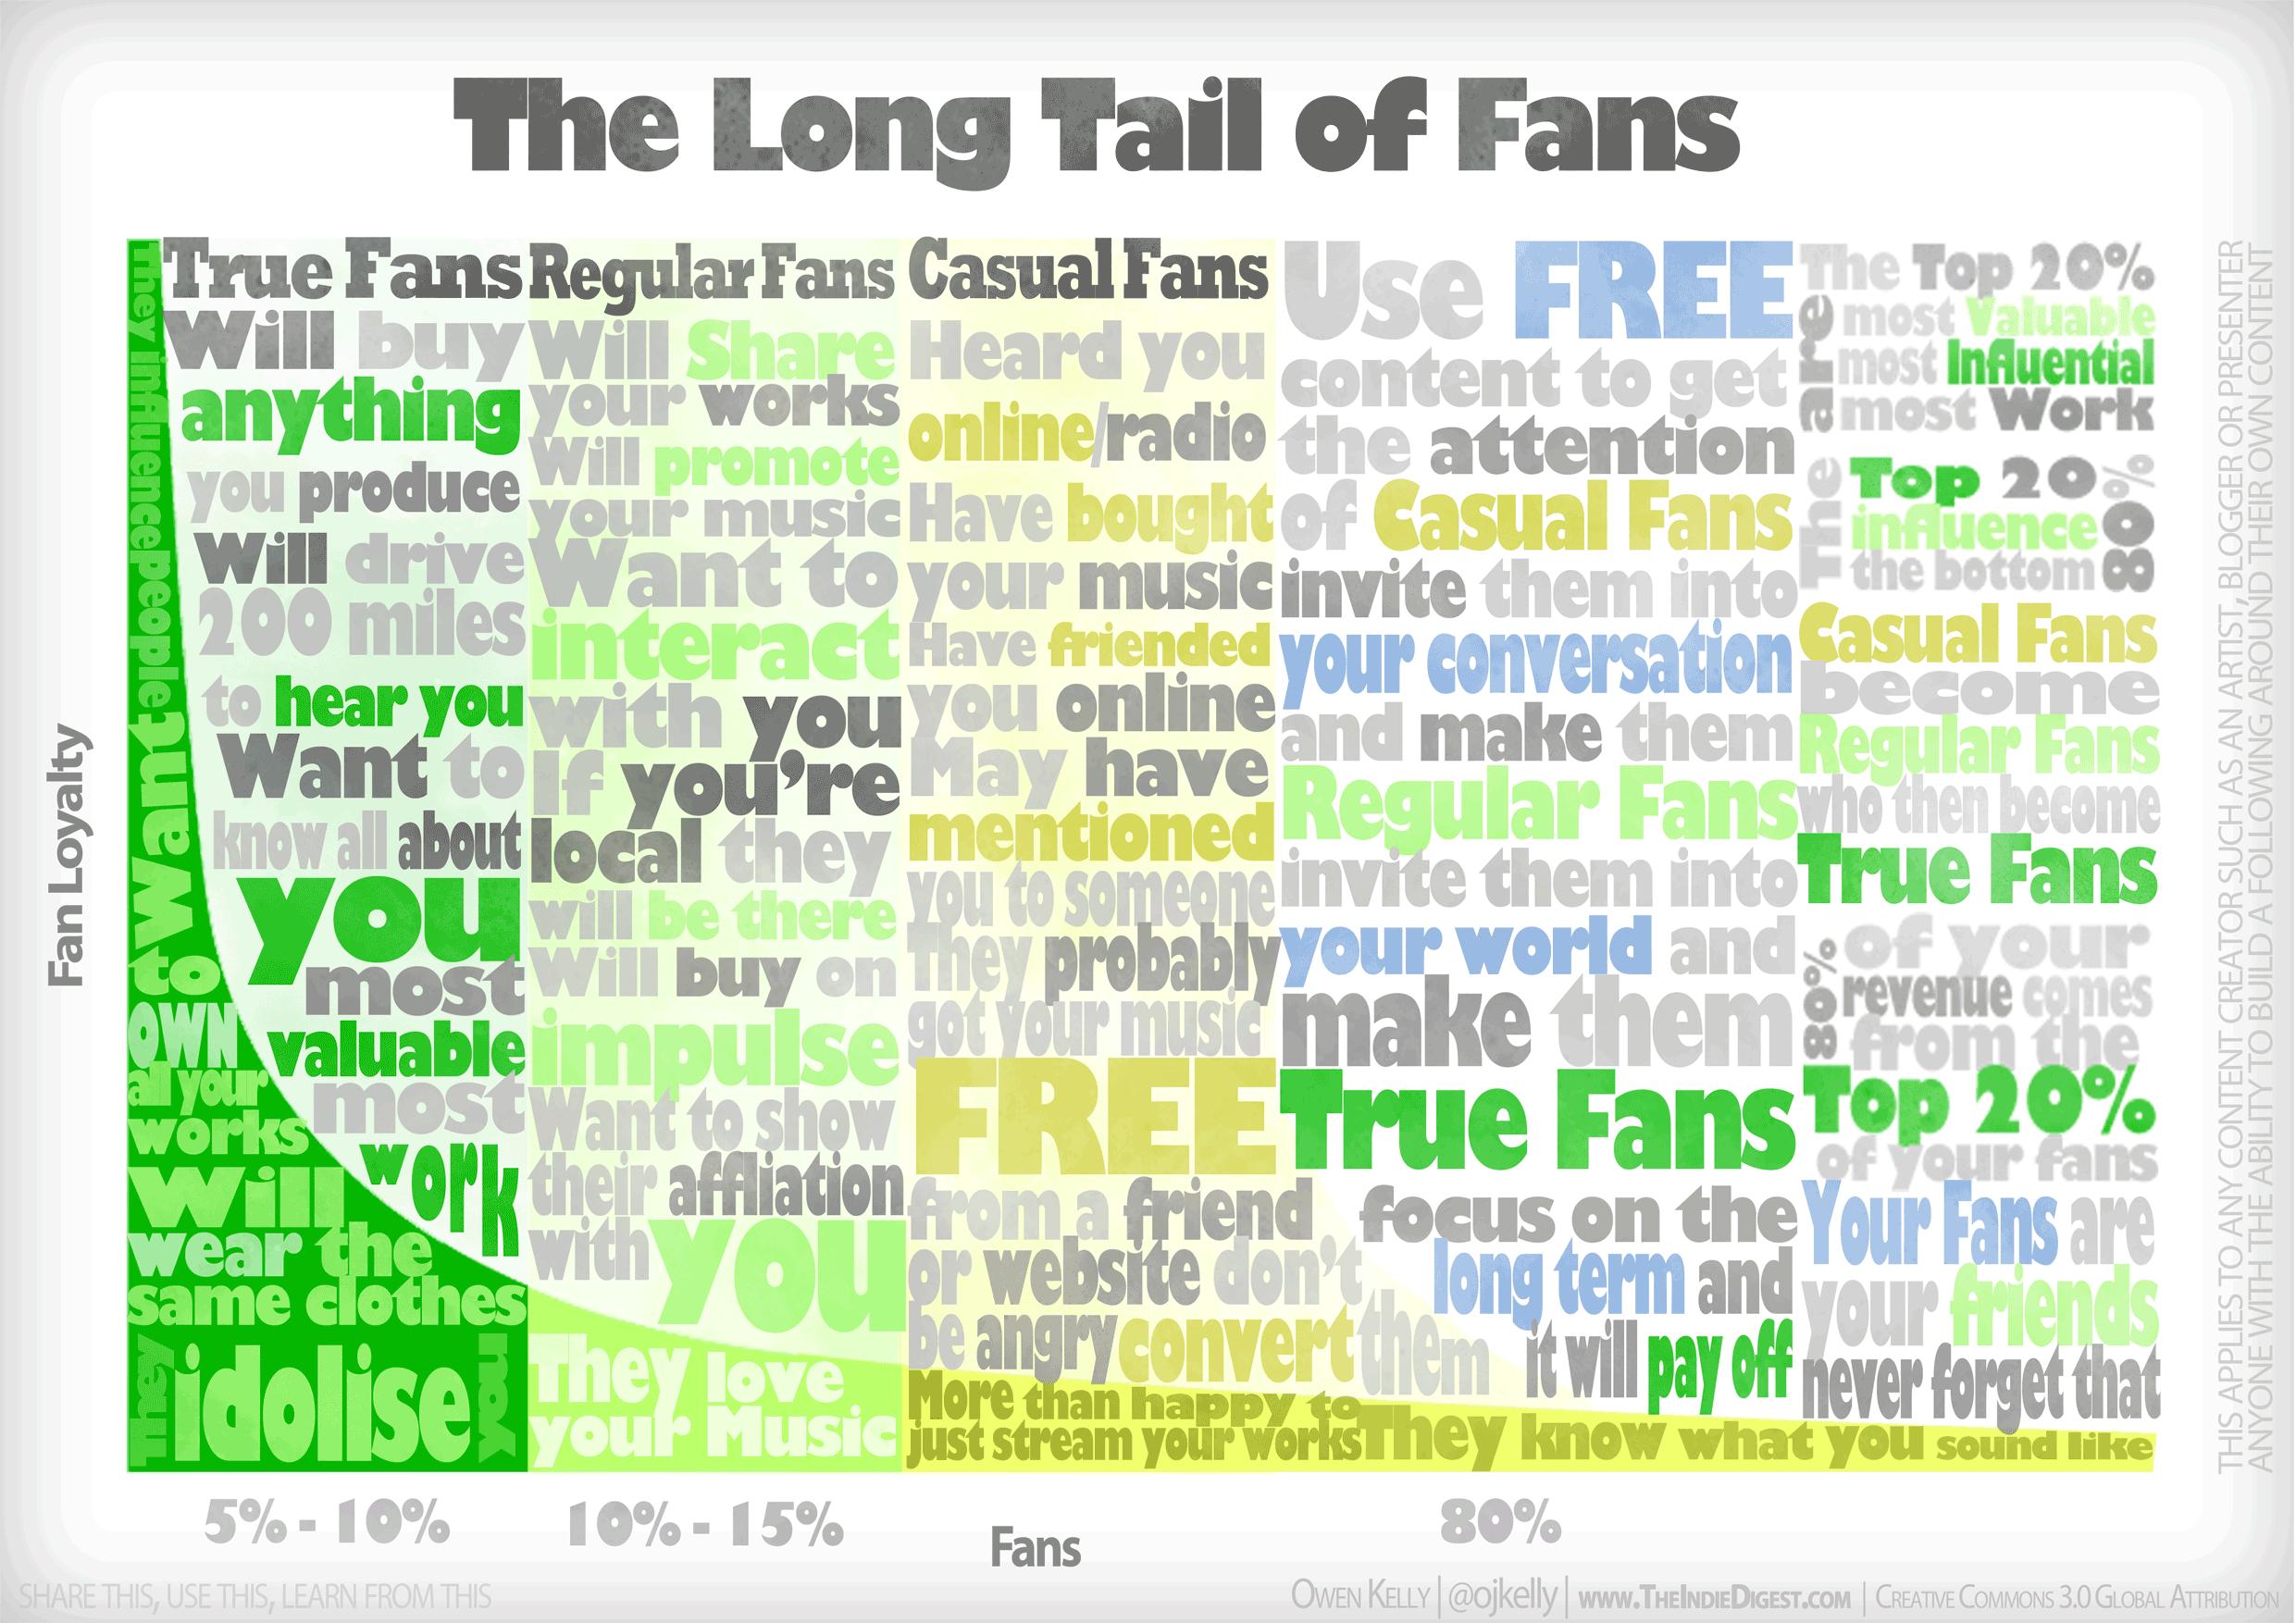 longtail_of_fans_web